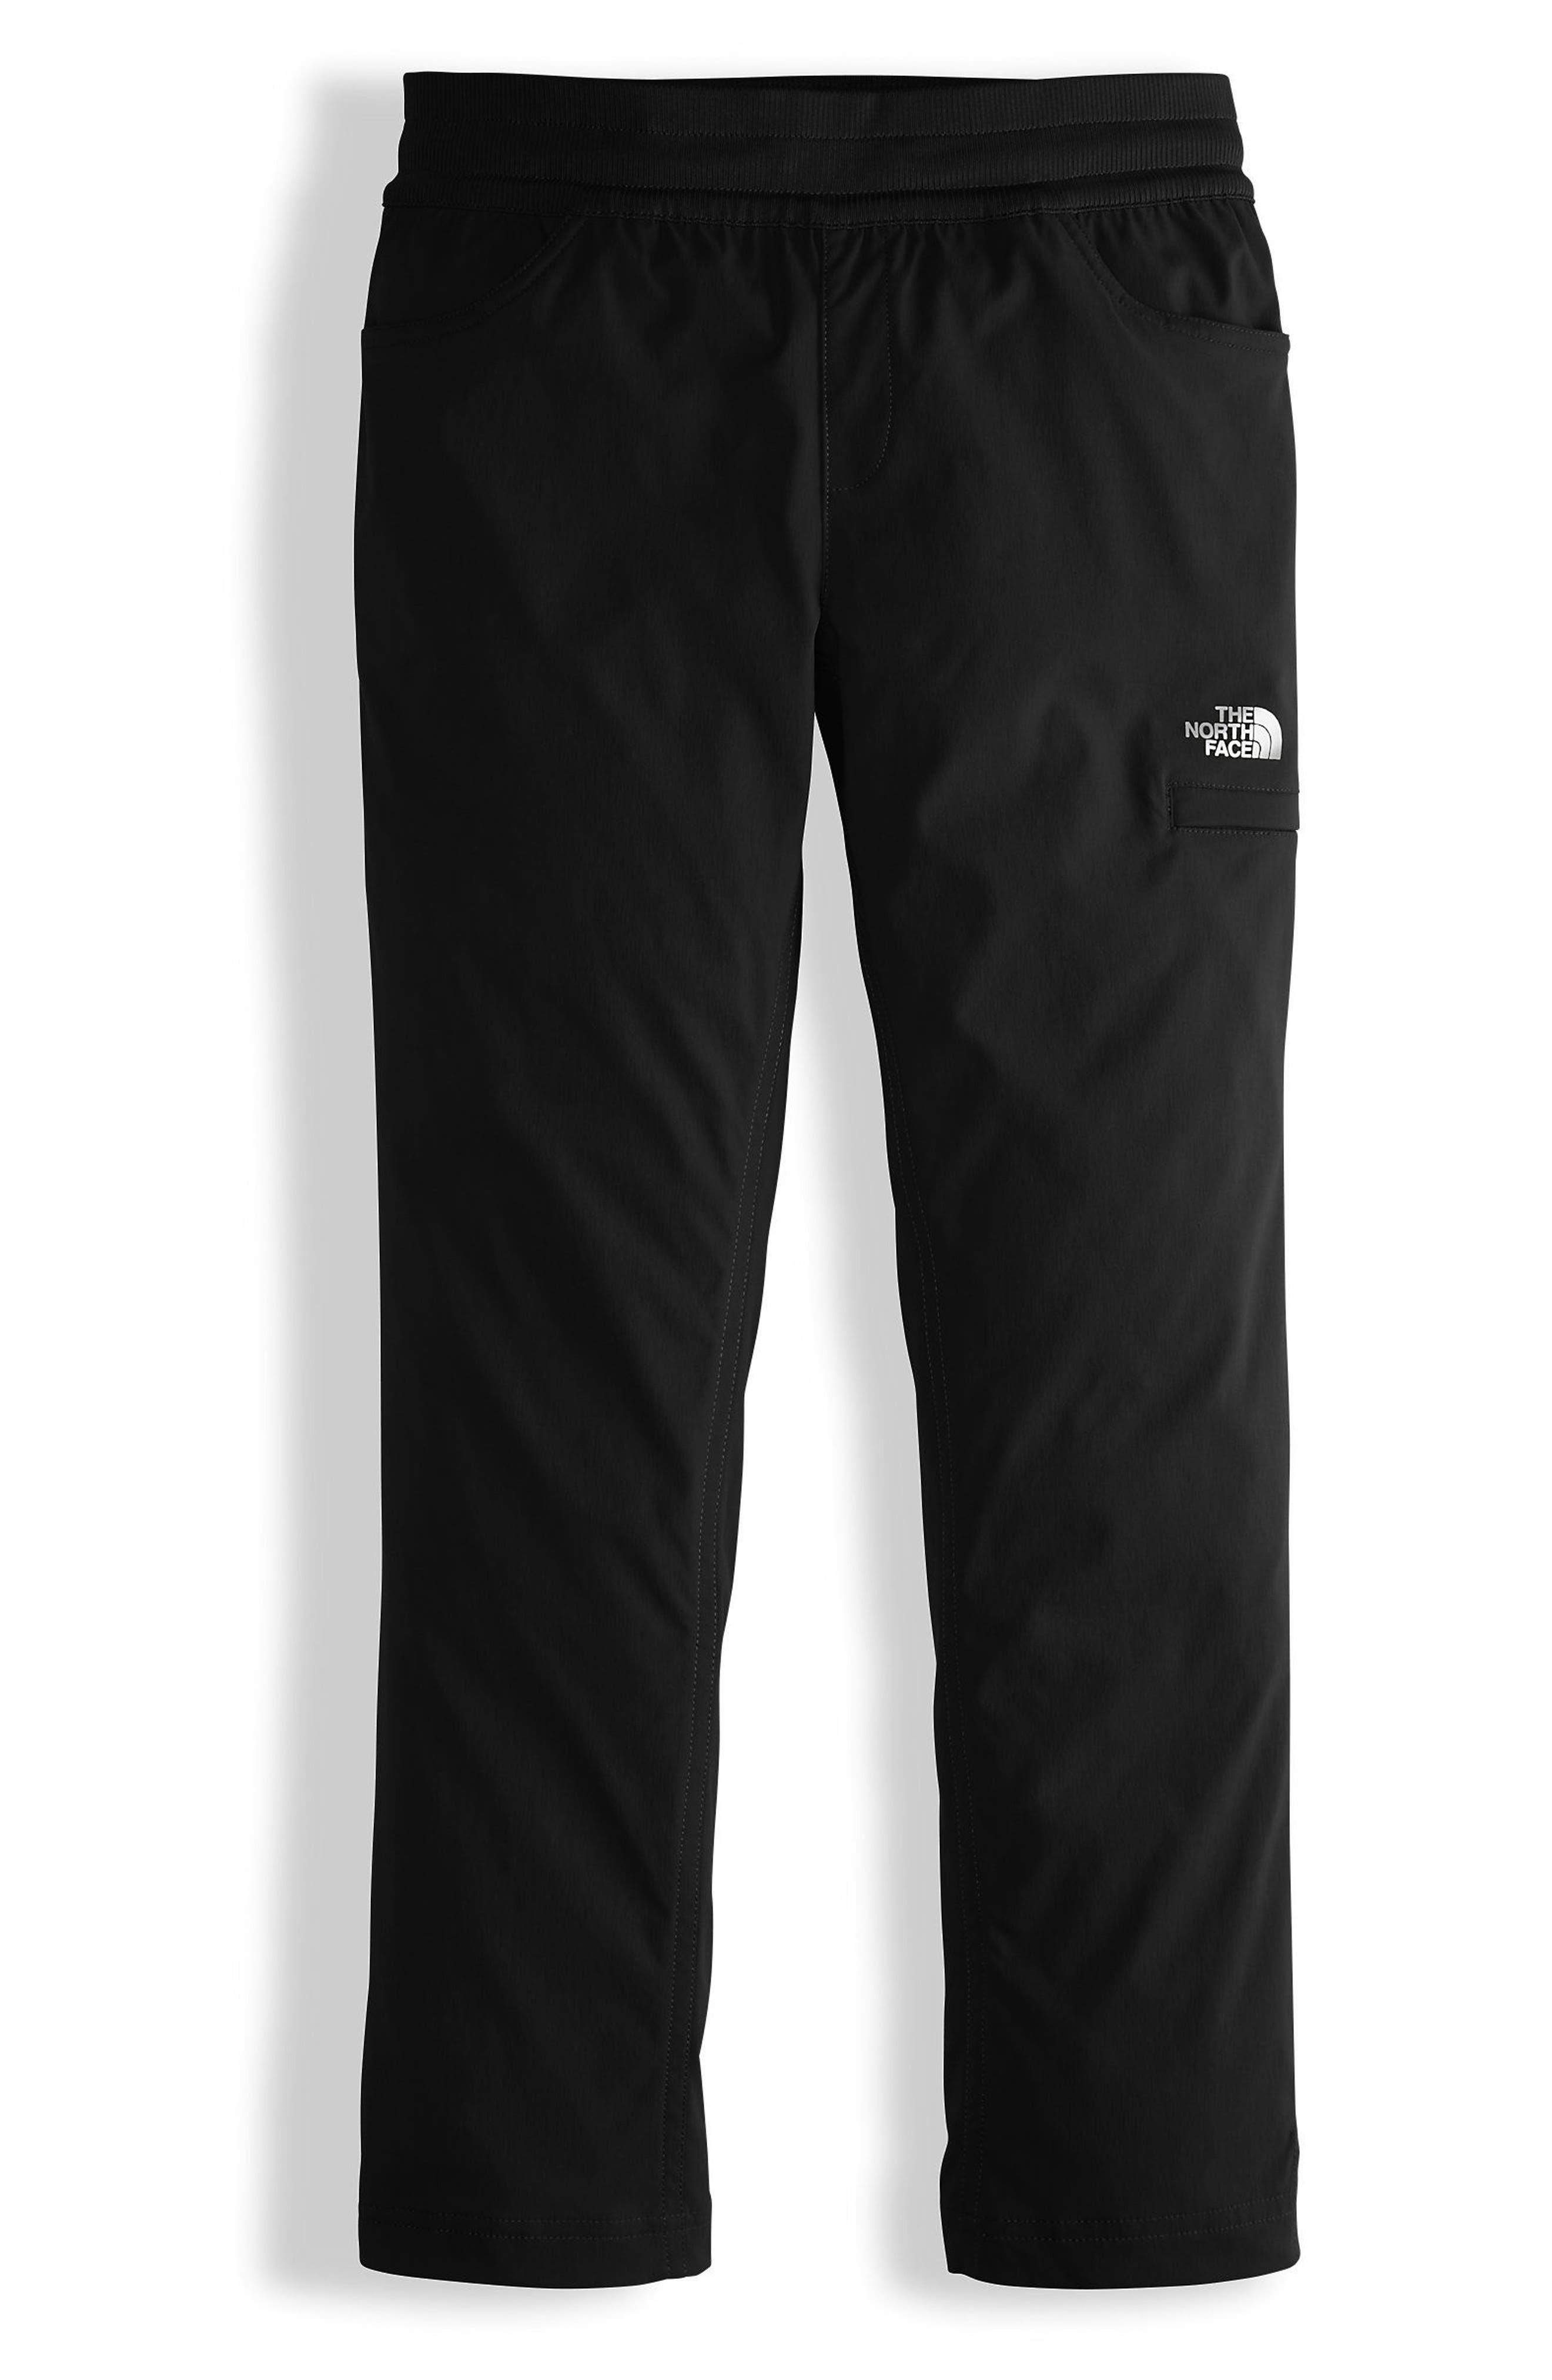 Aphrodite HD Luxe Pants,                         Main,                         color, Tnf Black